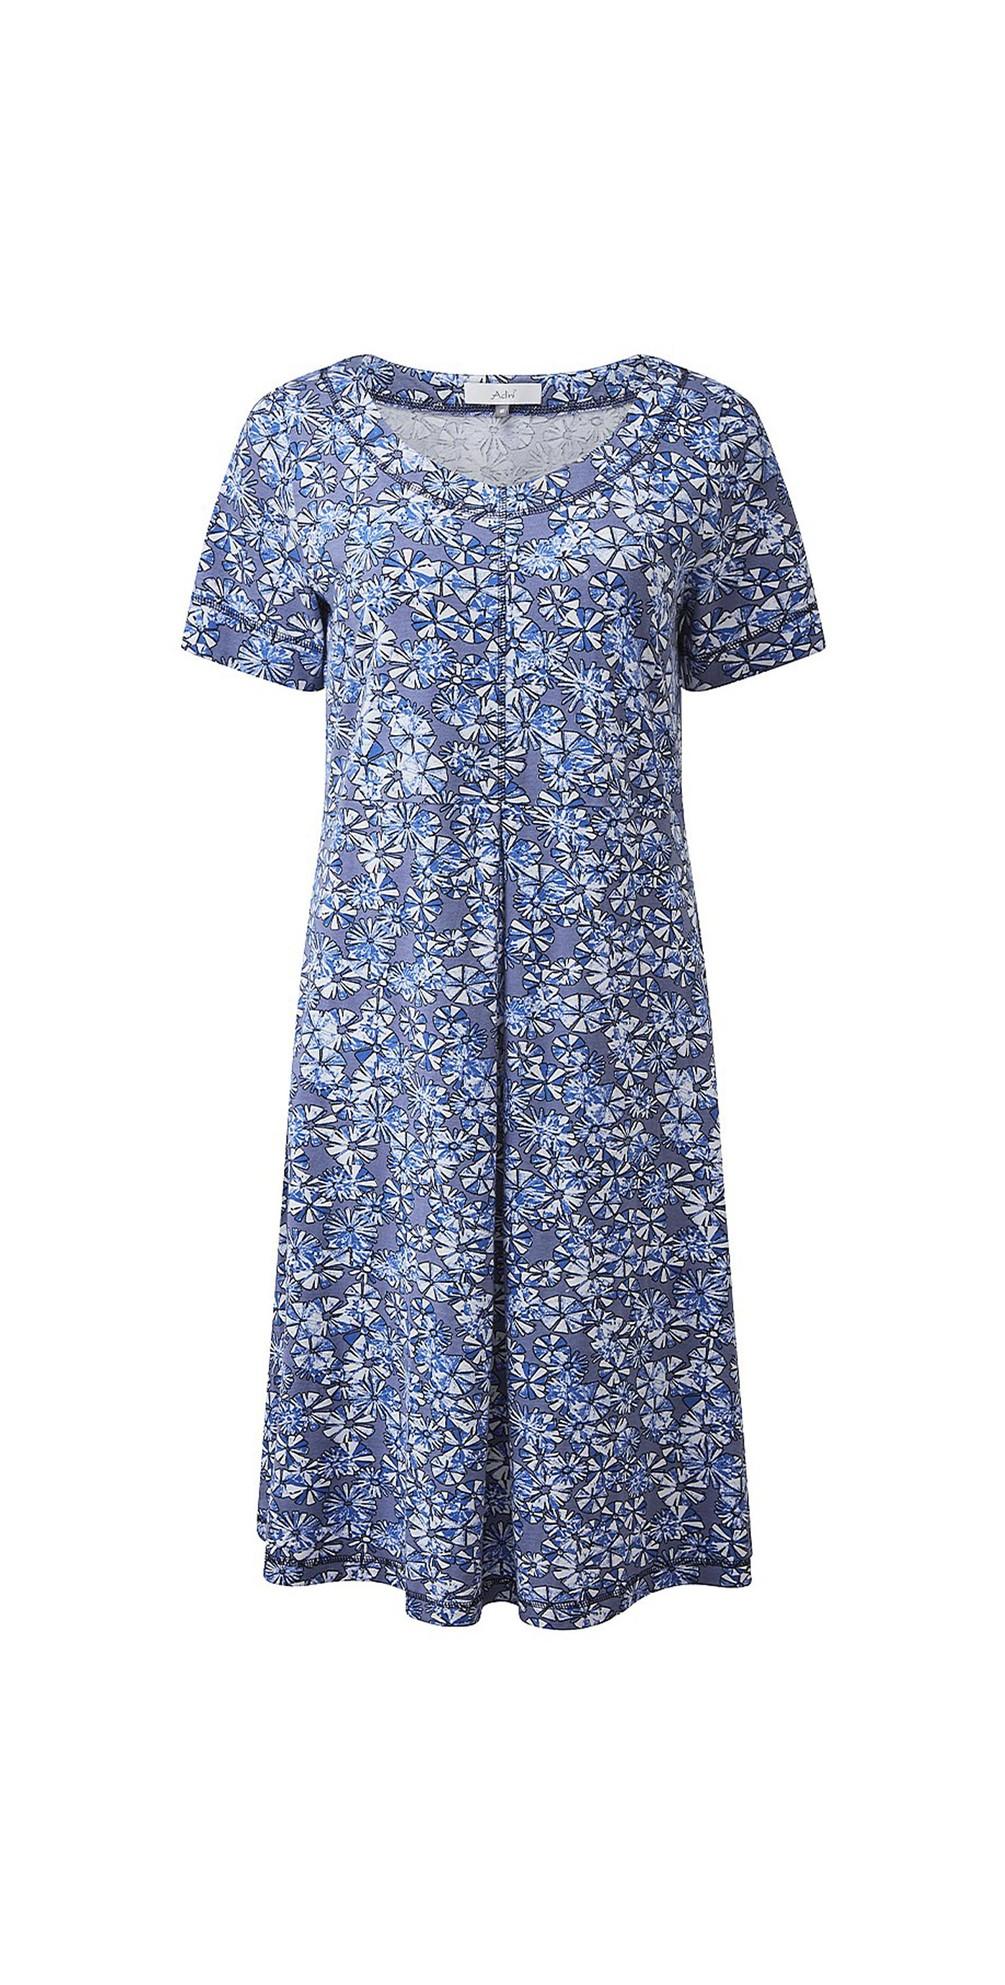 Lily Crosby Print Dress main image